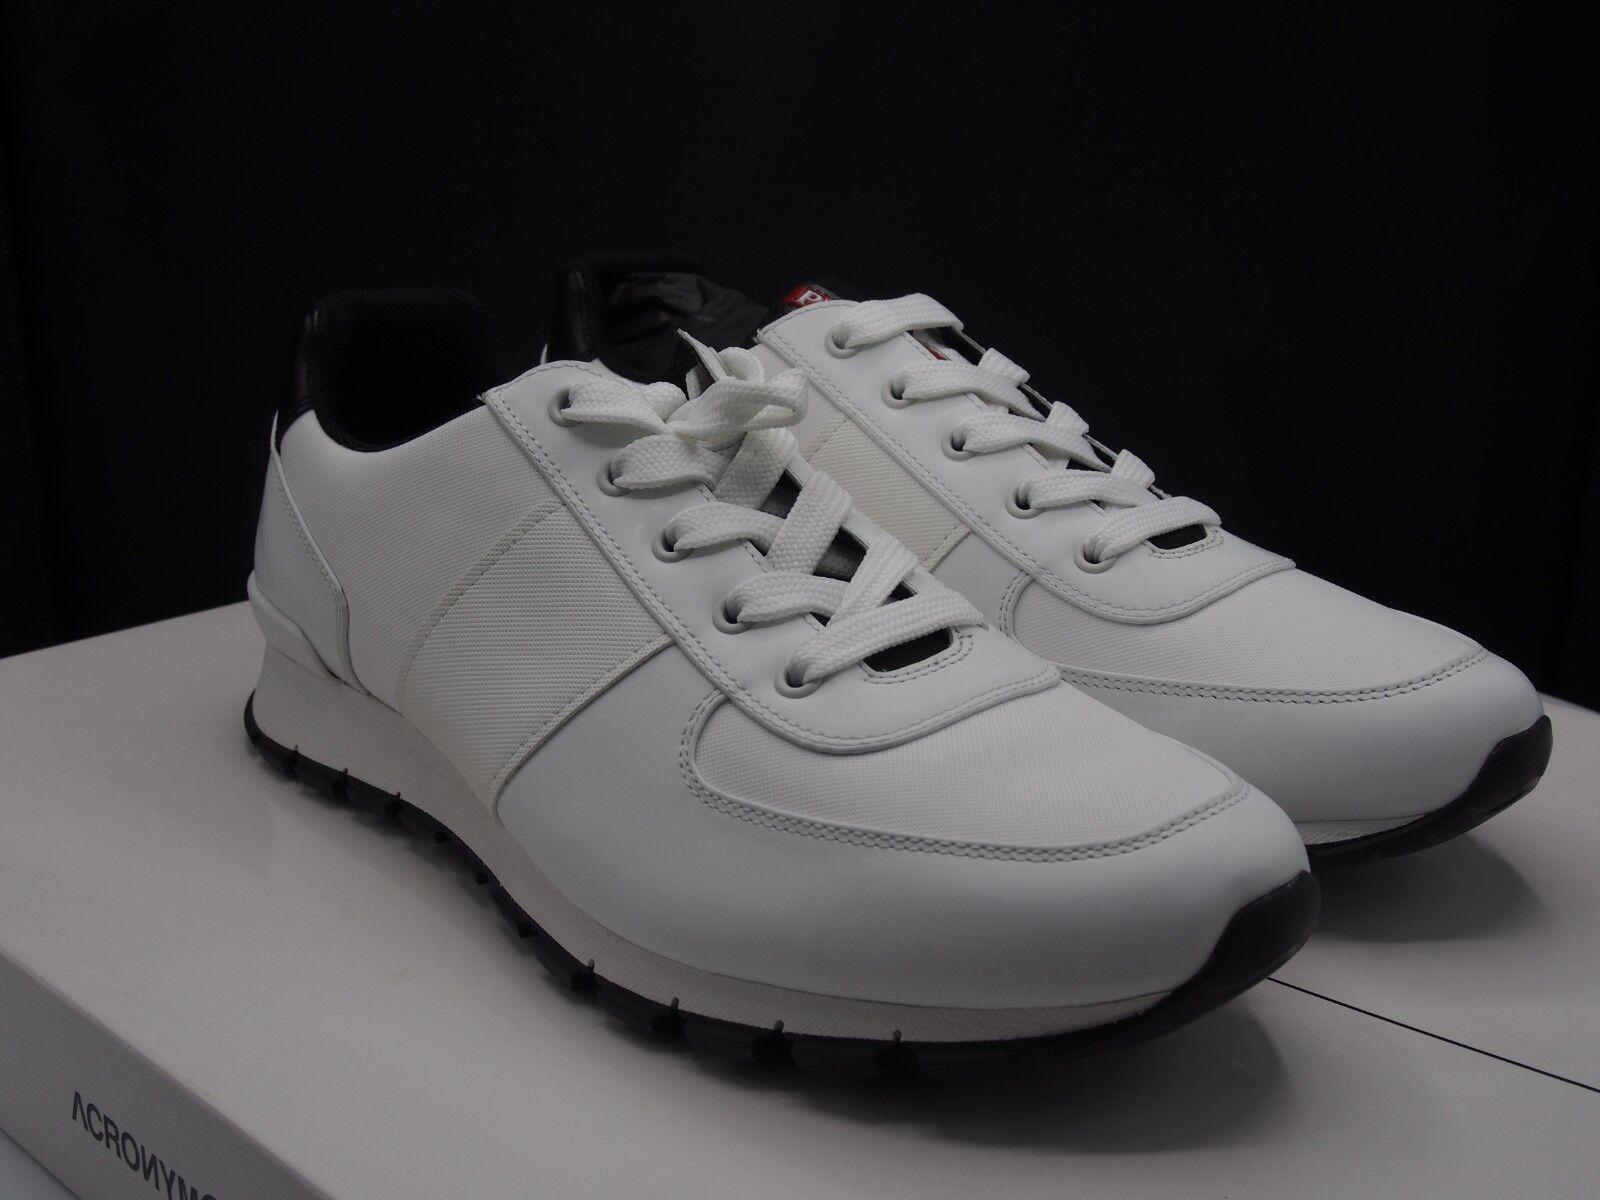 73e8b047c942 PRADA White Leather Runner Retail 650 Men s size size size 10 US 1014e8